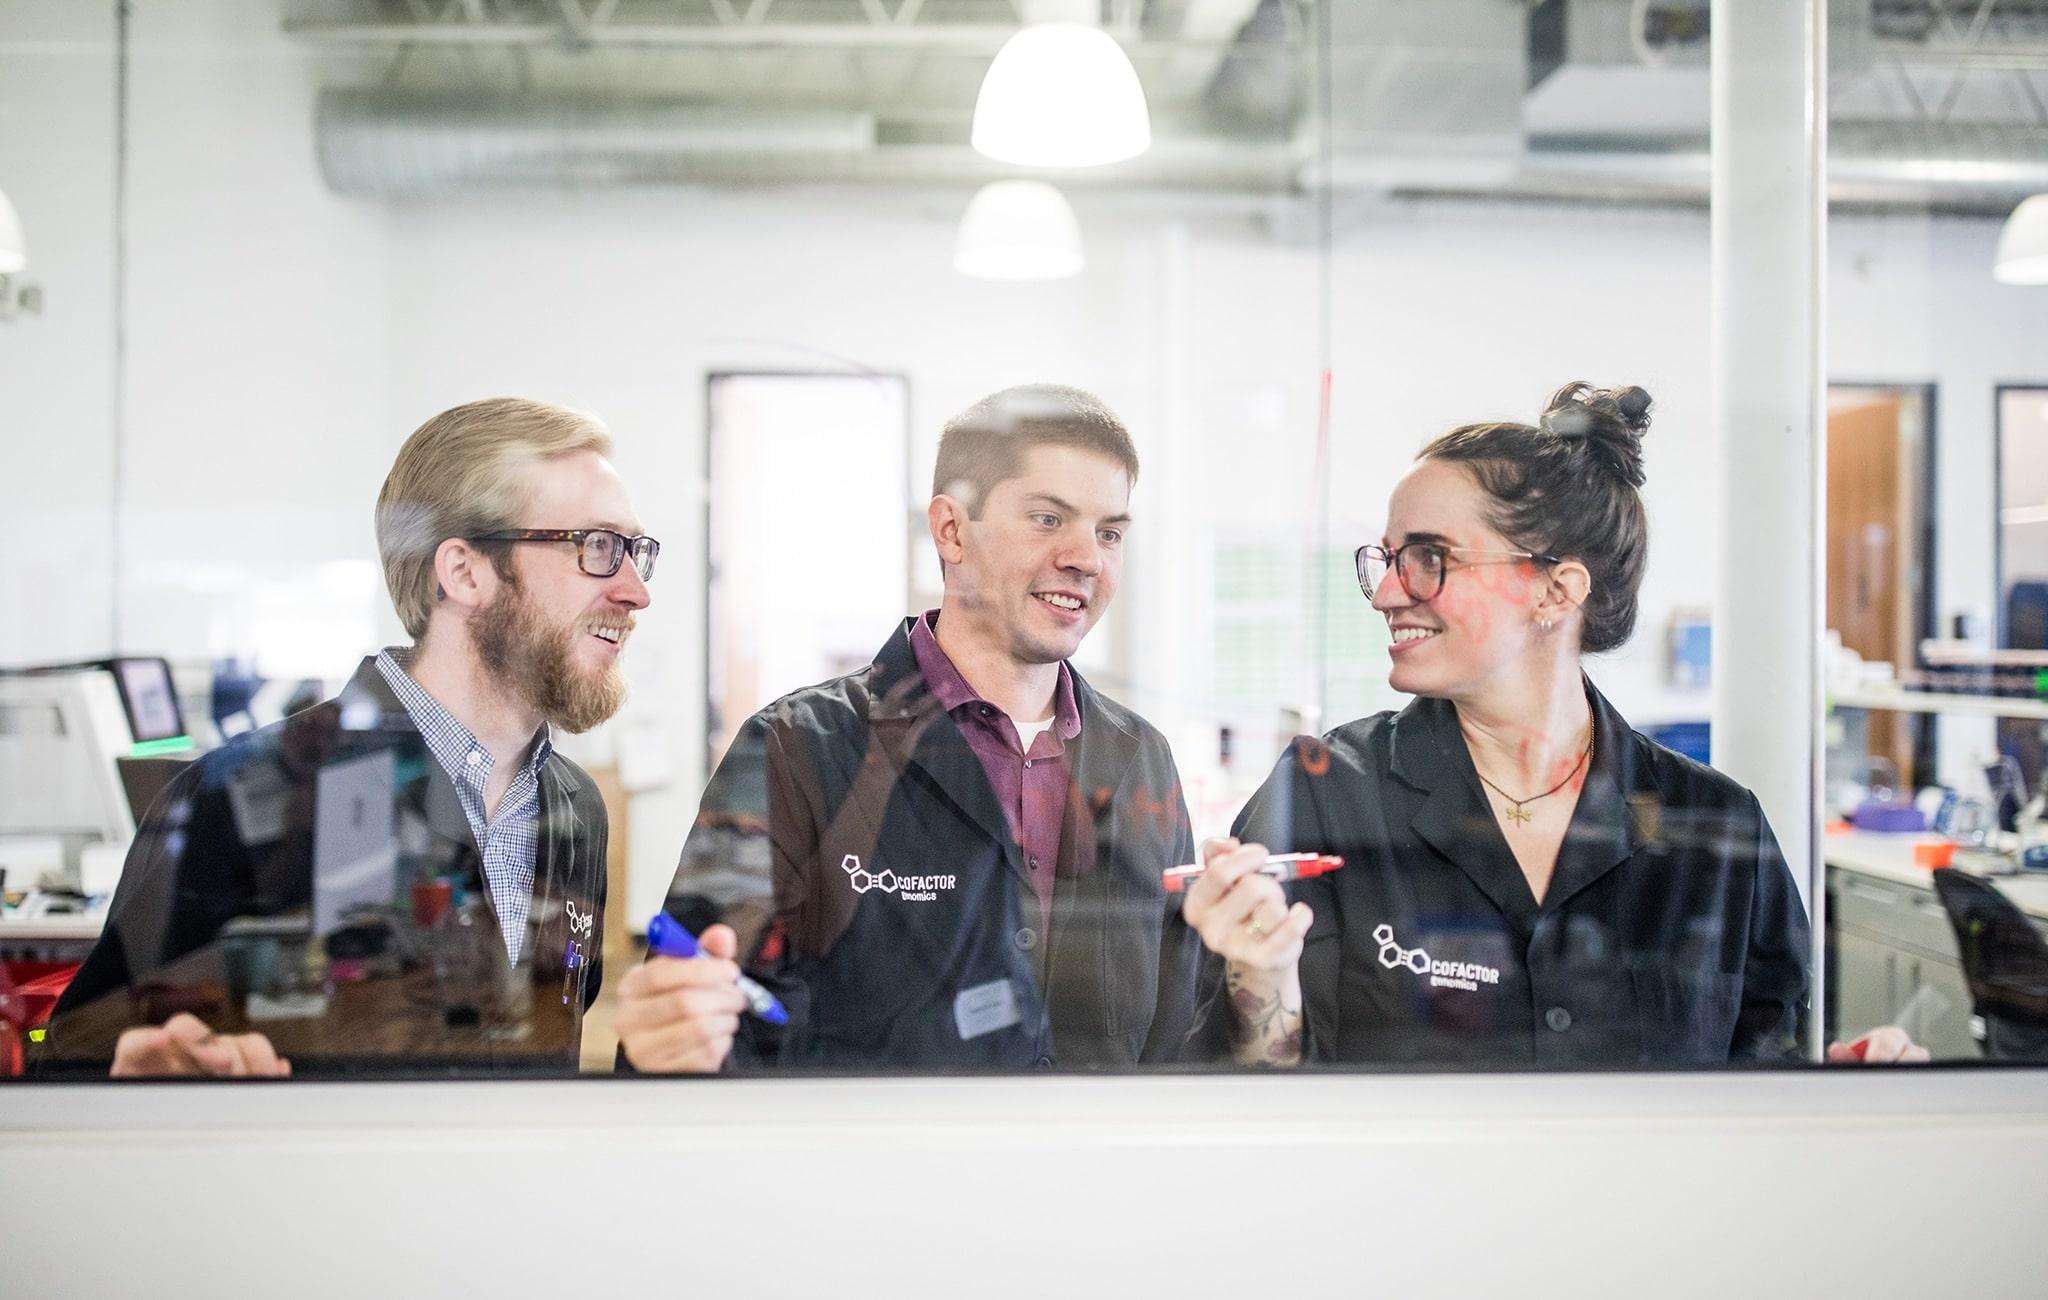 Three people behind glass